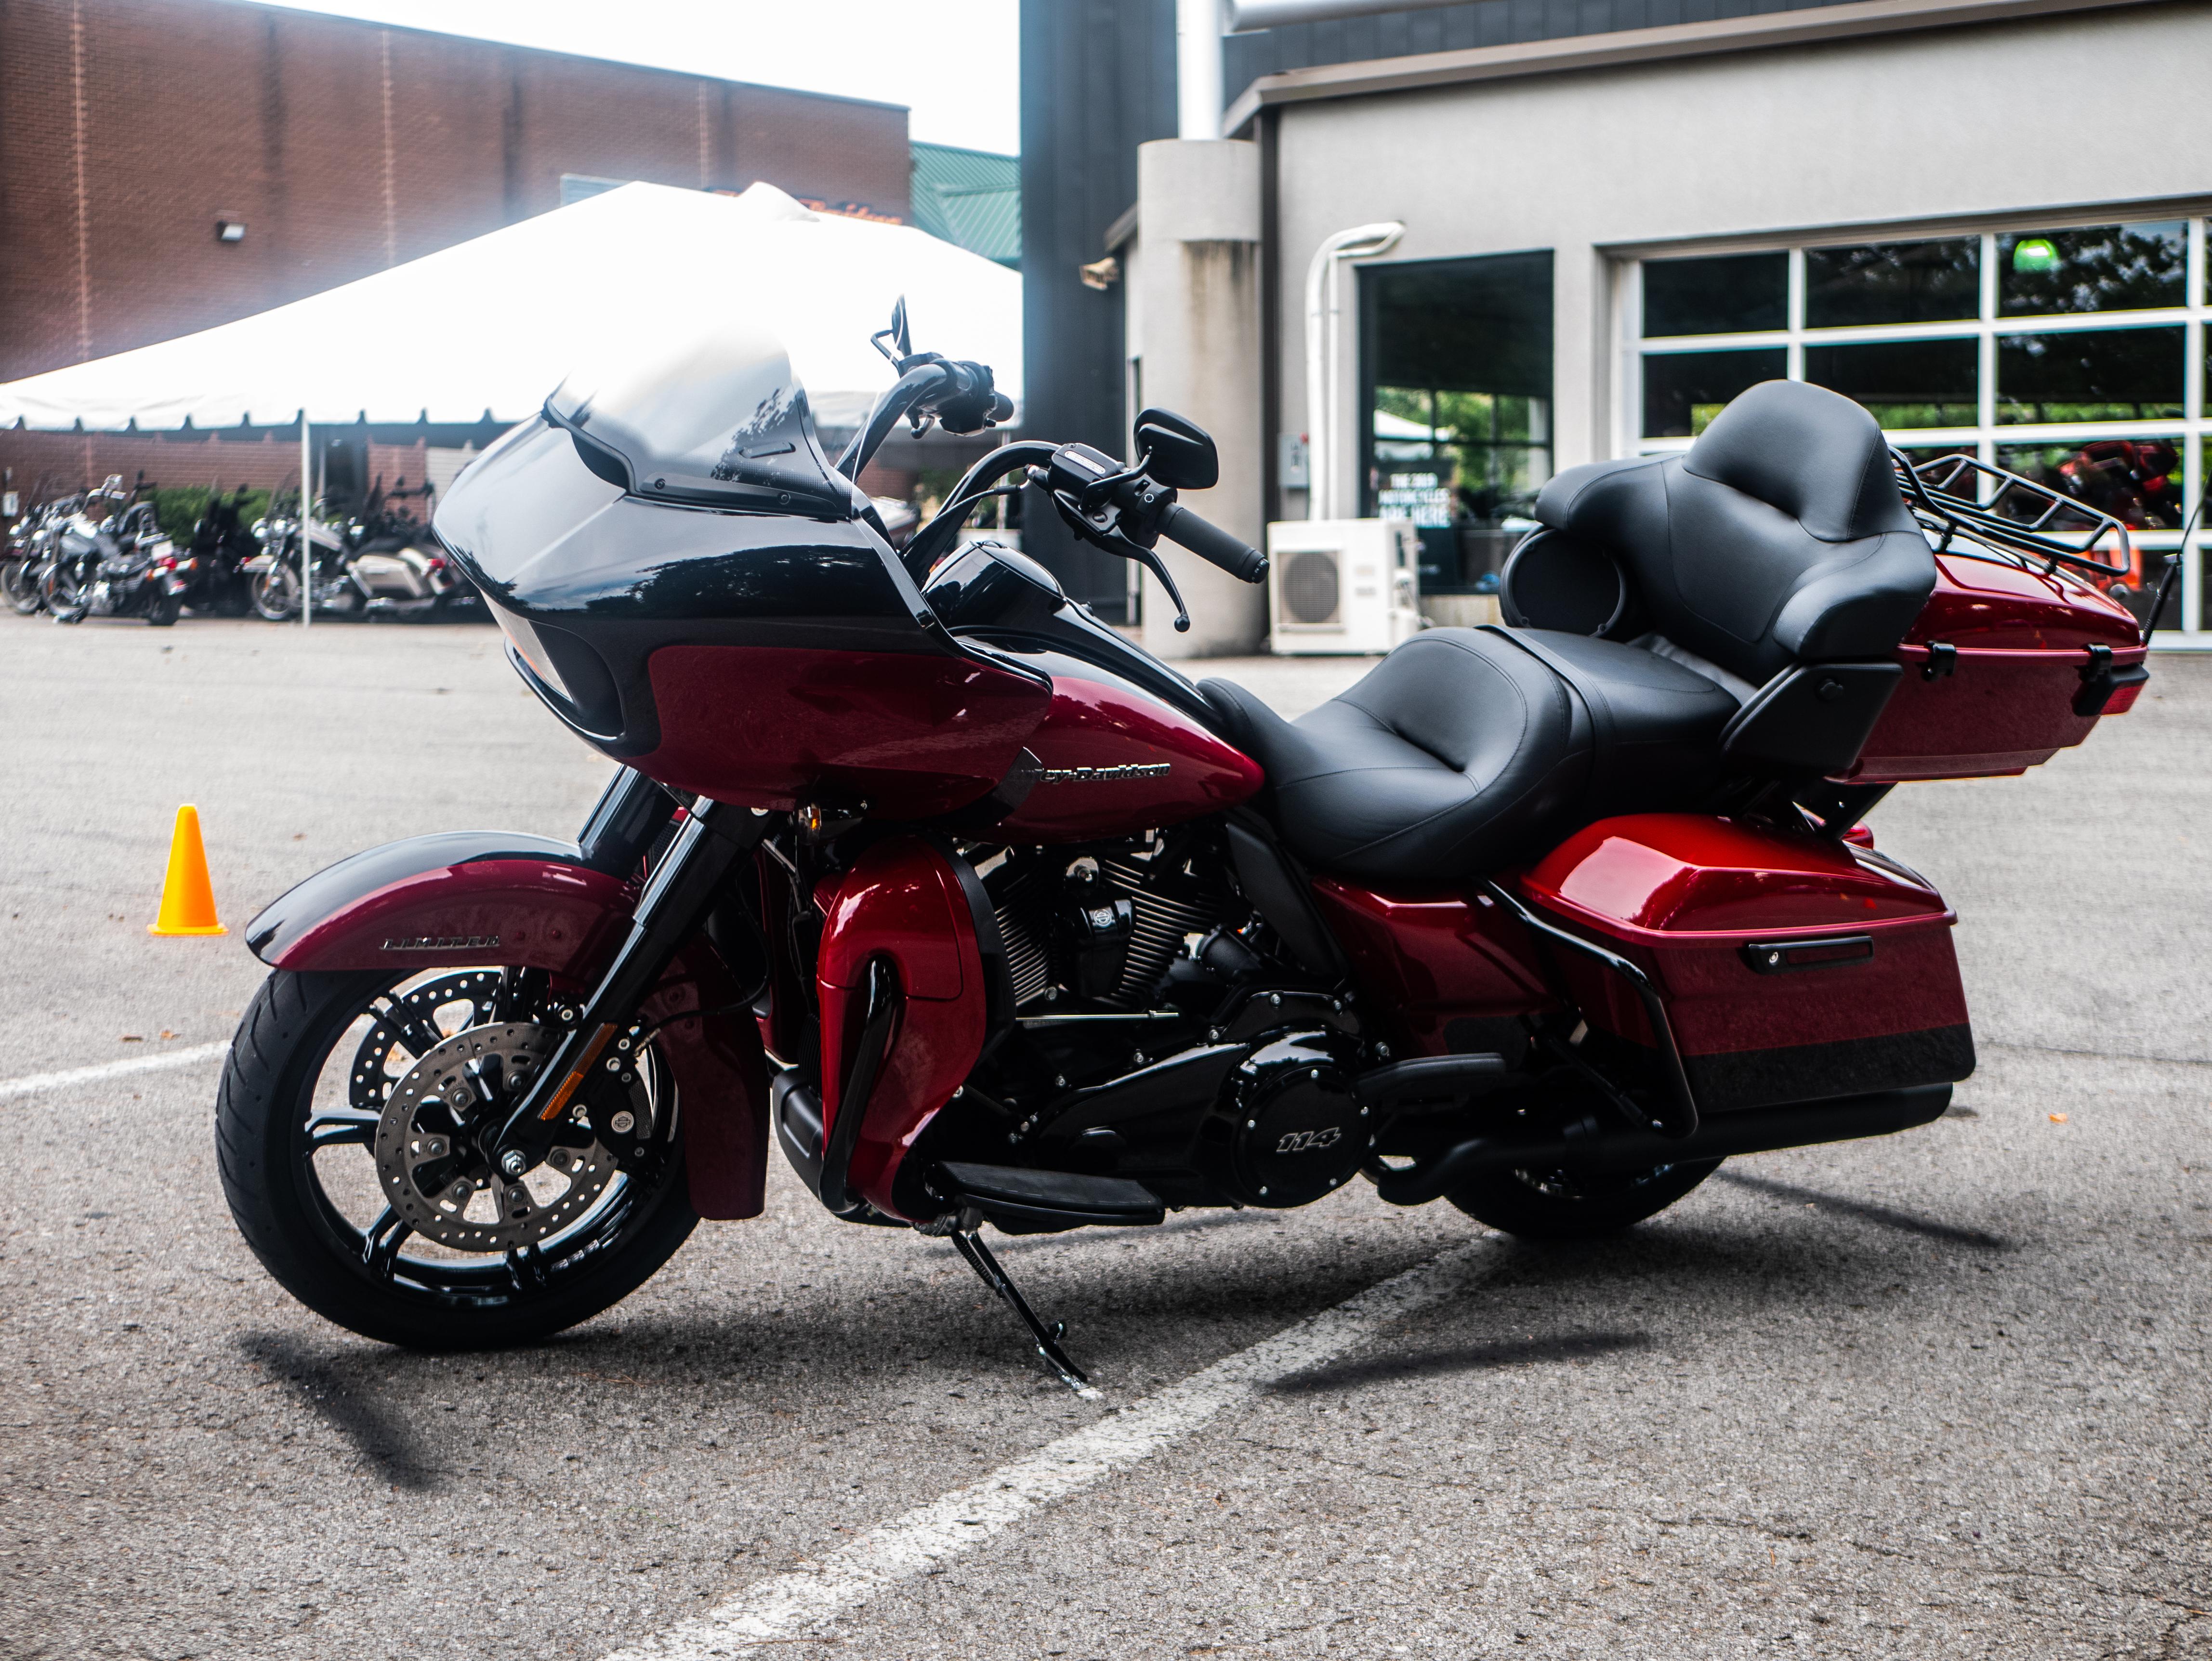 New 2020 Harley-Davidson Road Glide Limited